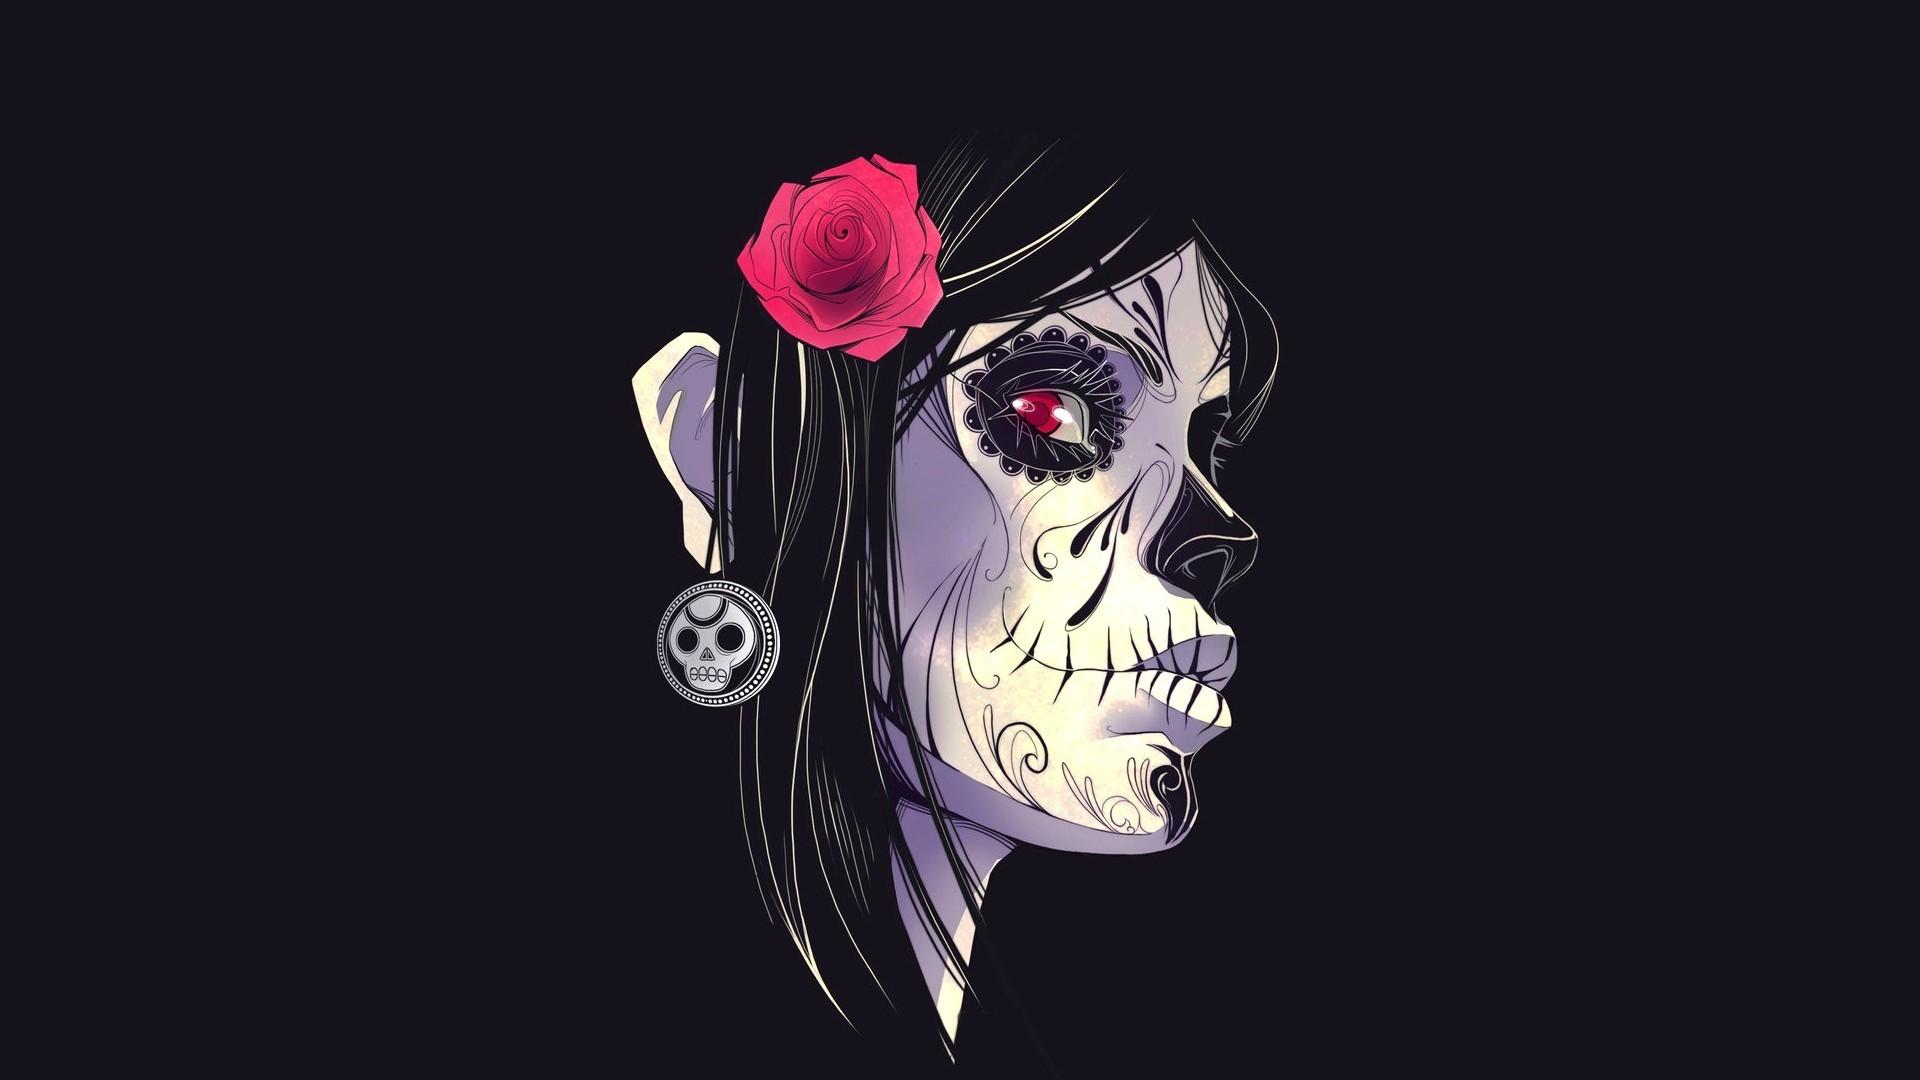 Gothic skulls wallpaper wallpapertag - M r love wallpaper ...